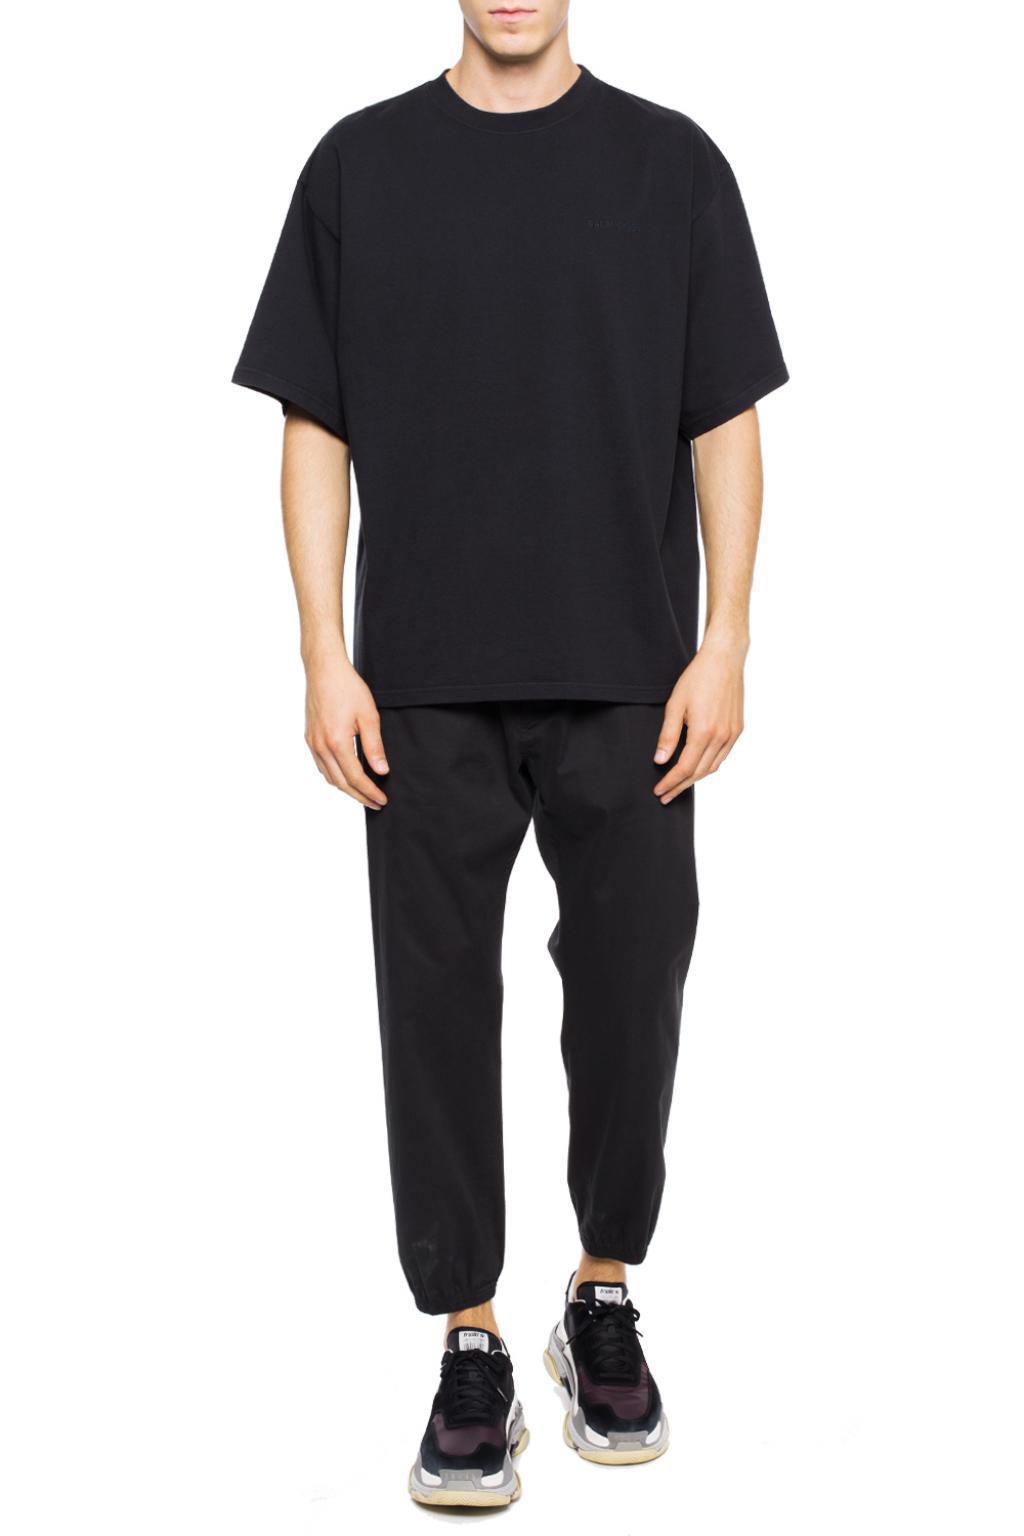 f5101c34 Balenciaga - Black Oversize' T-shirt for Men - Lyst. View fullscreen